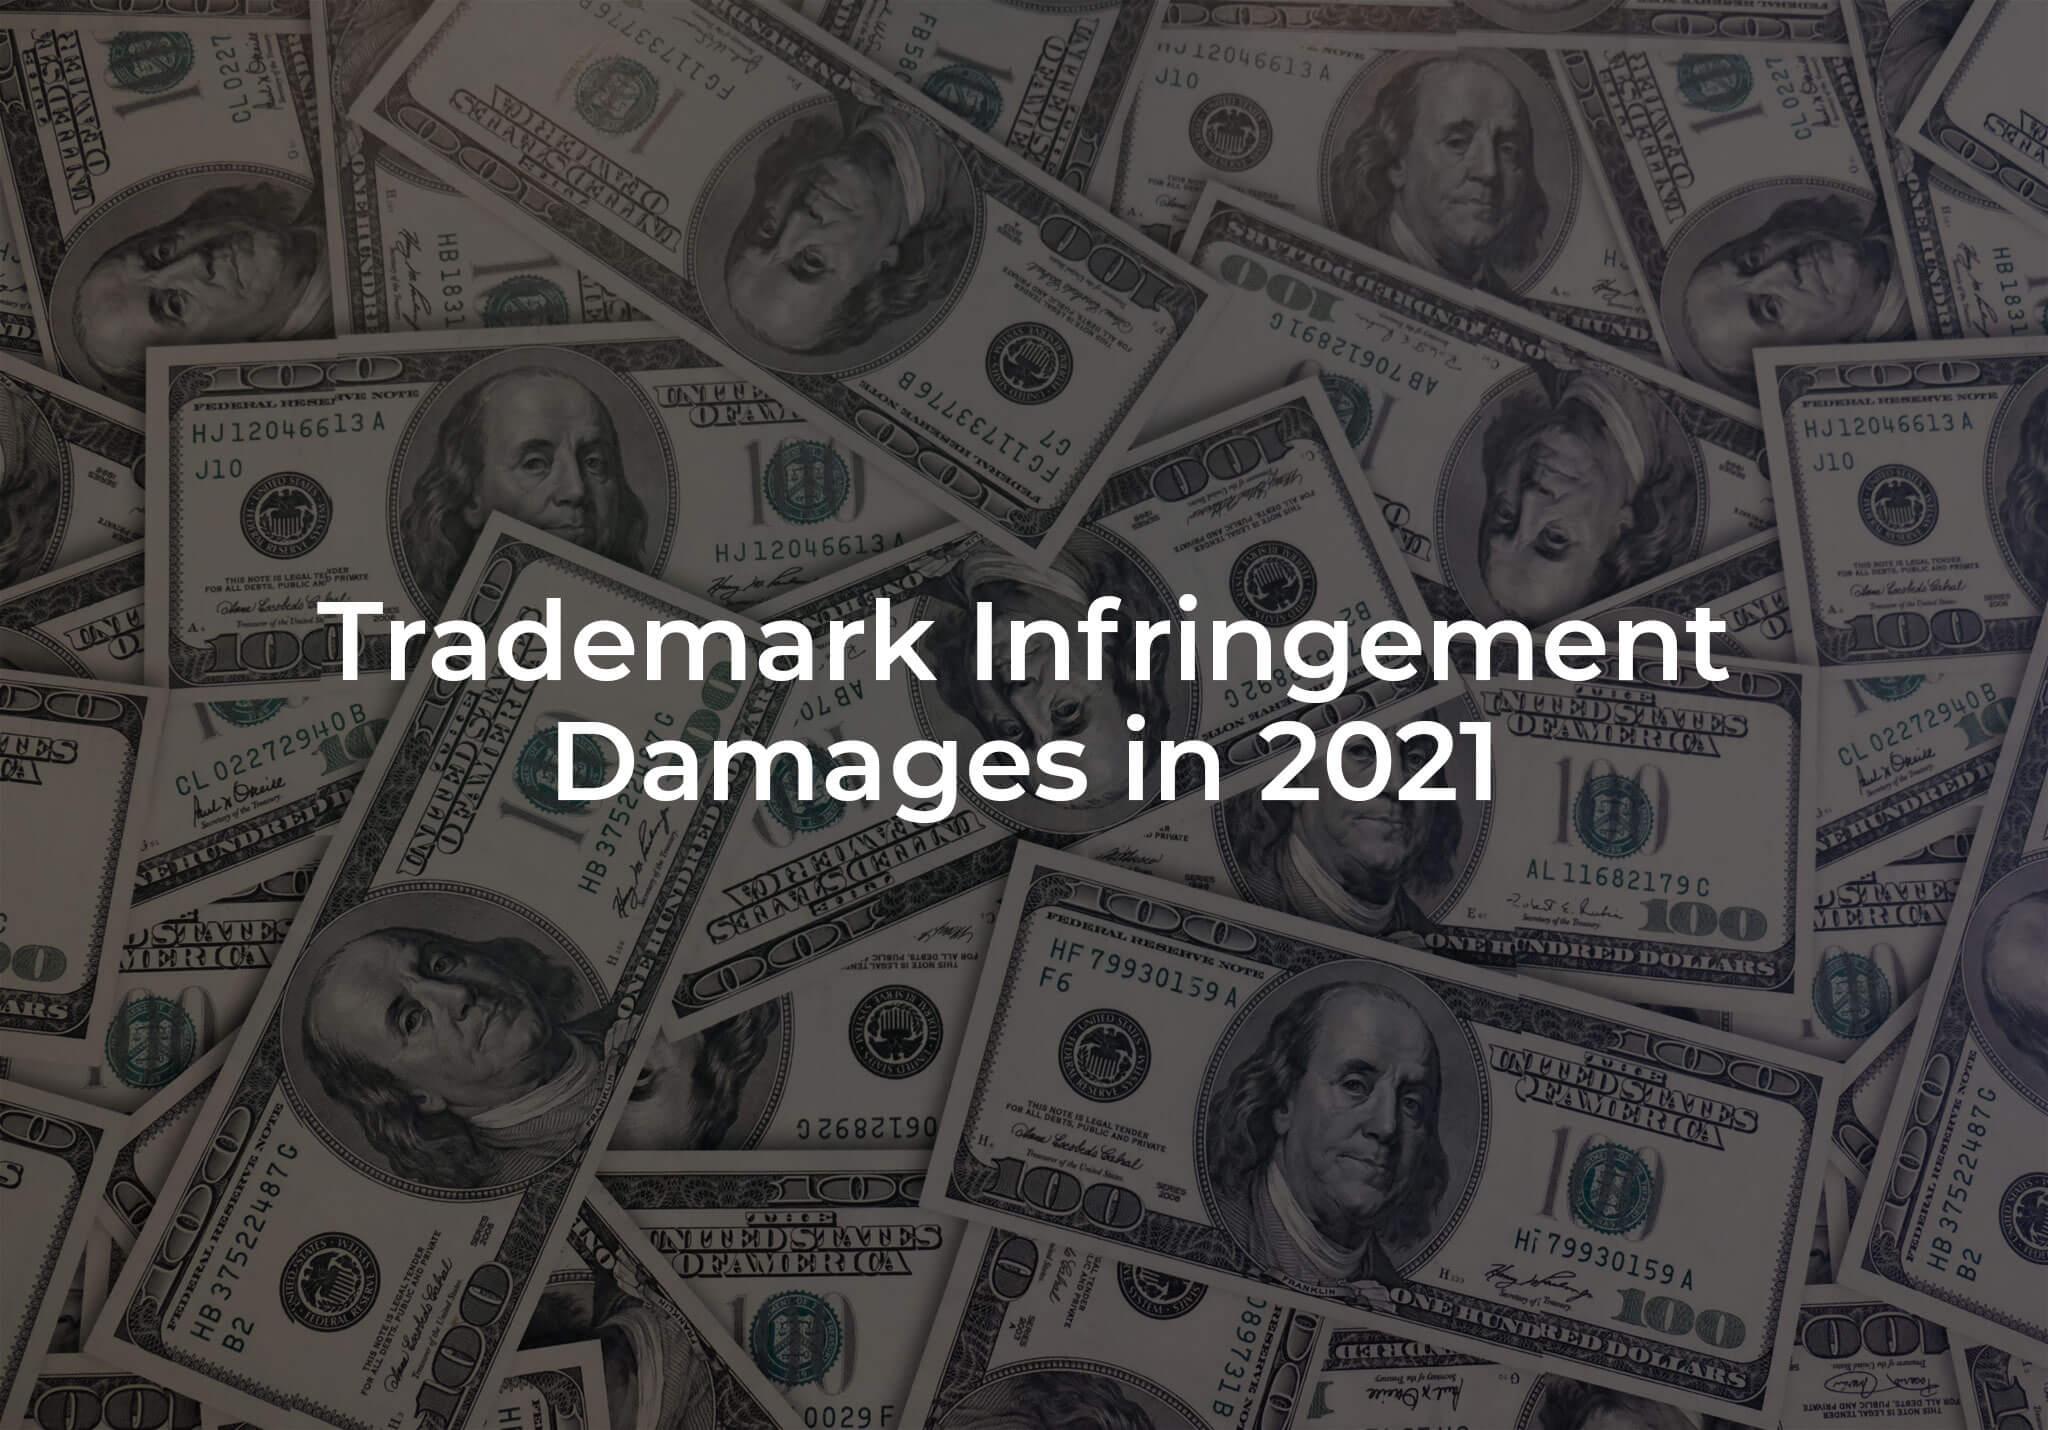 Trademark Infringement Damages in 2021